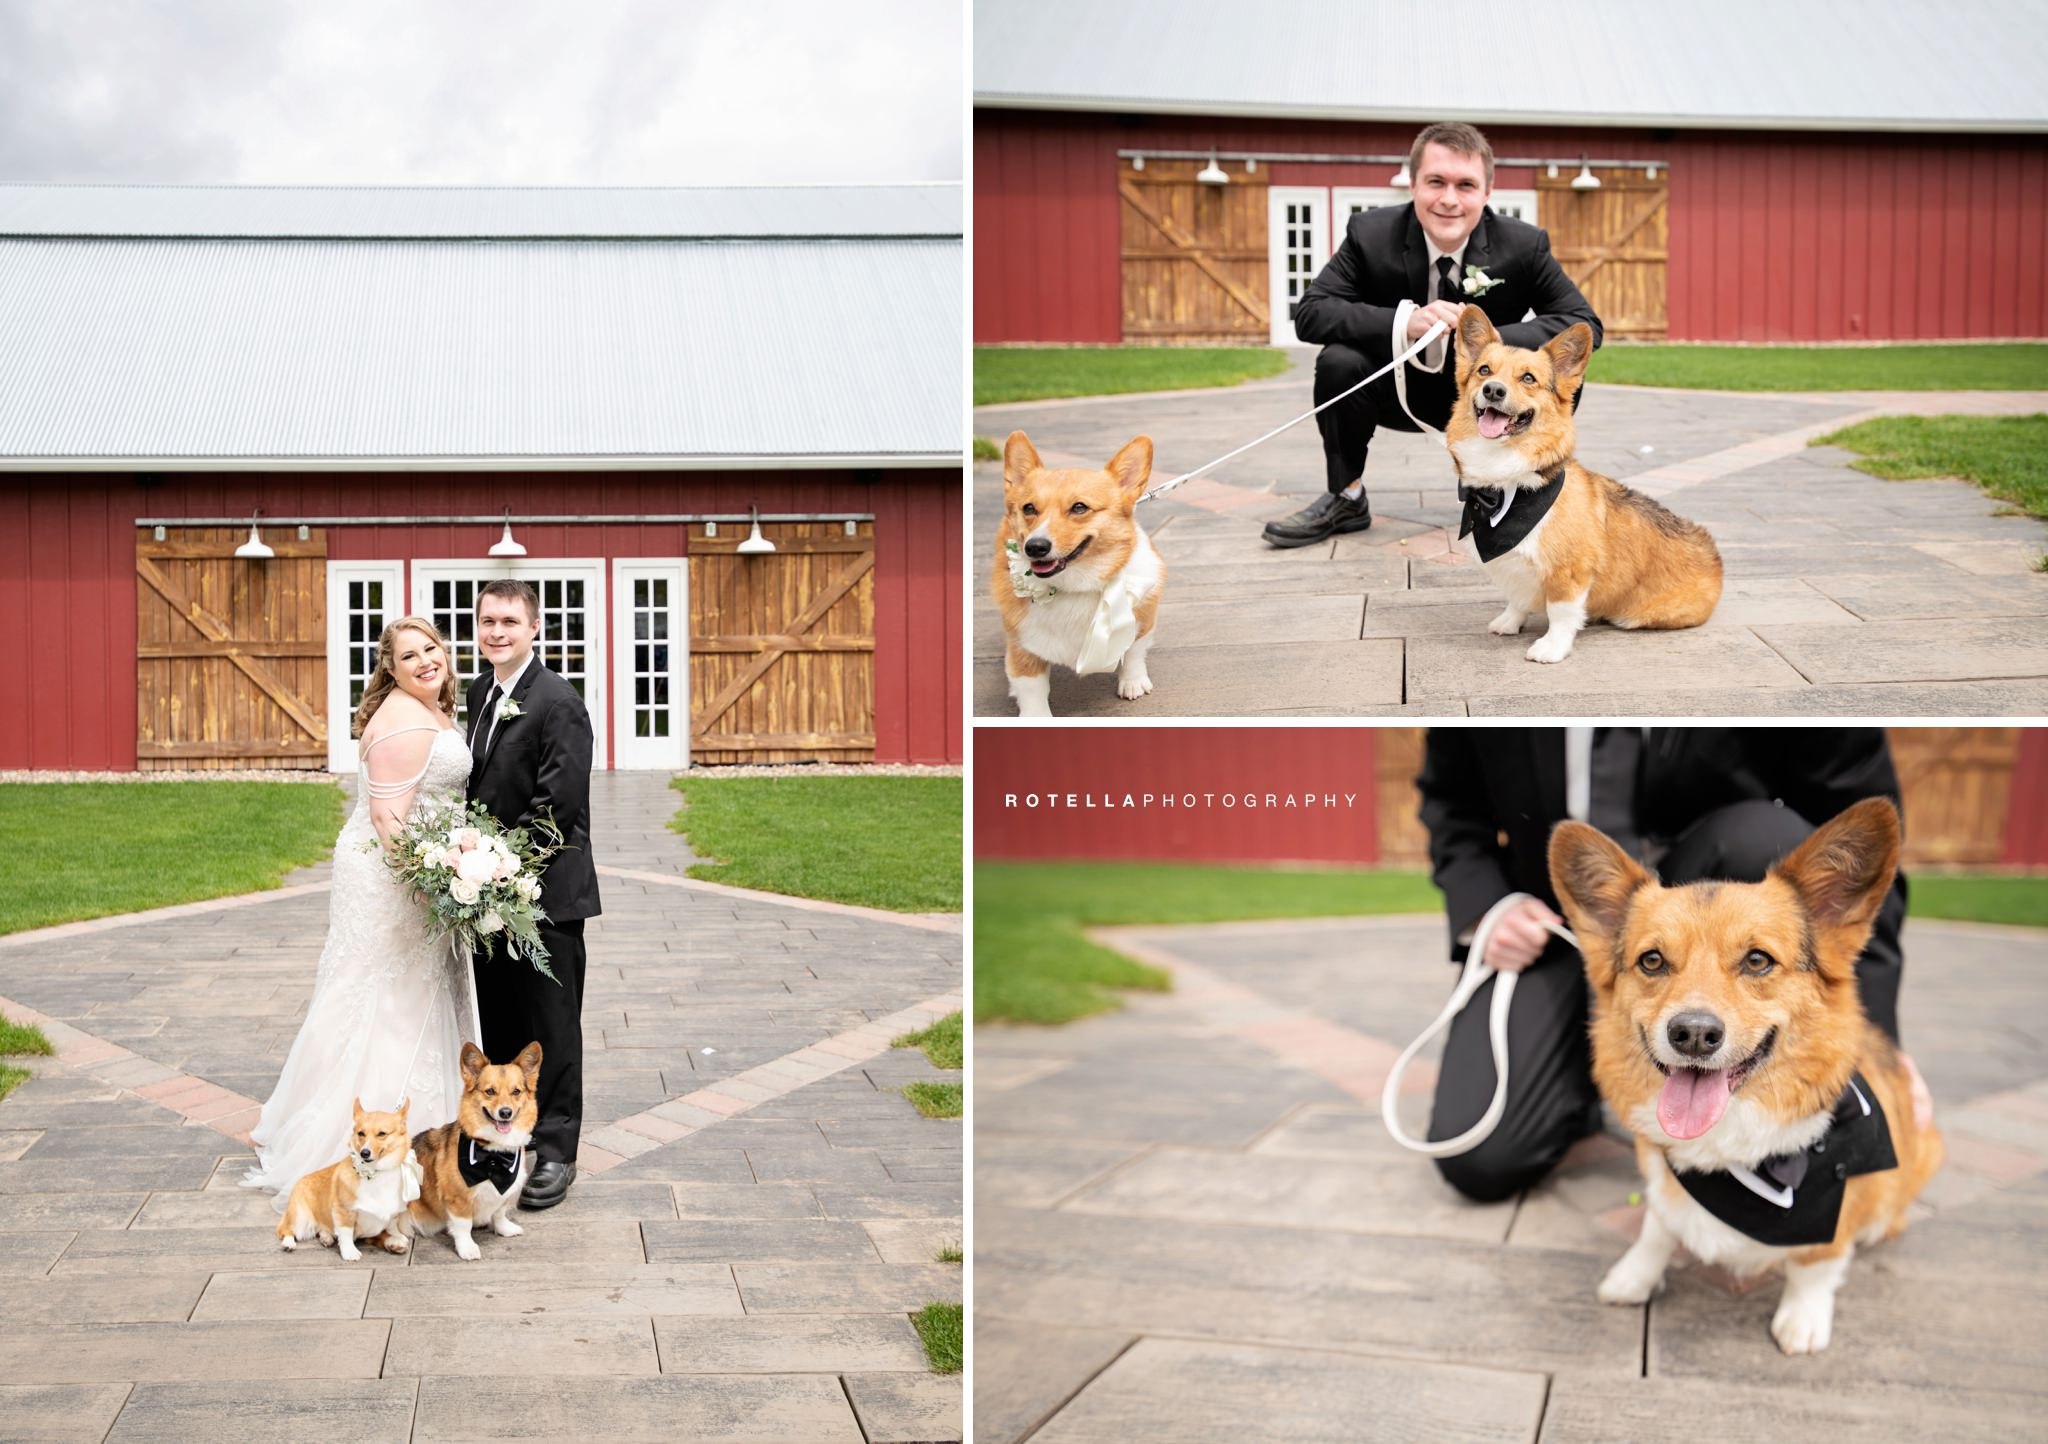 Cassie-Corbin-Wedding-05-25-2019-Rotella-Photography-PREV-97-482_BLOG.jpg